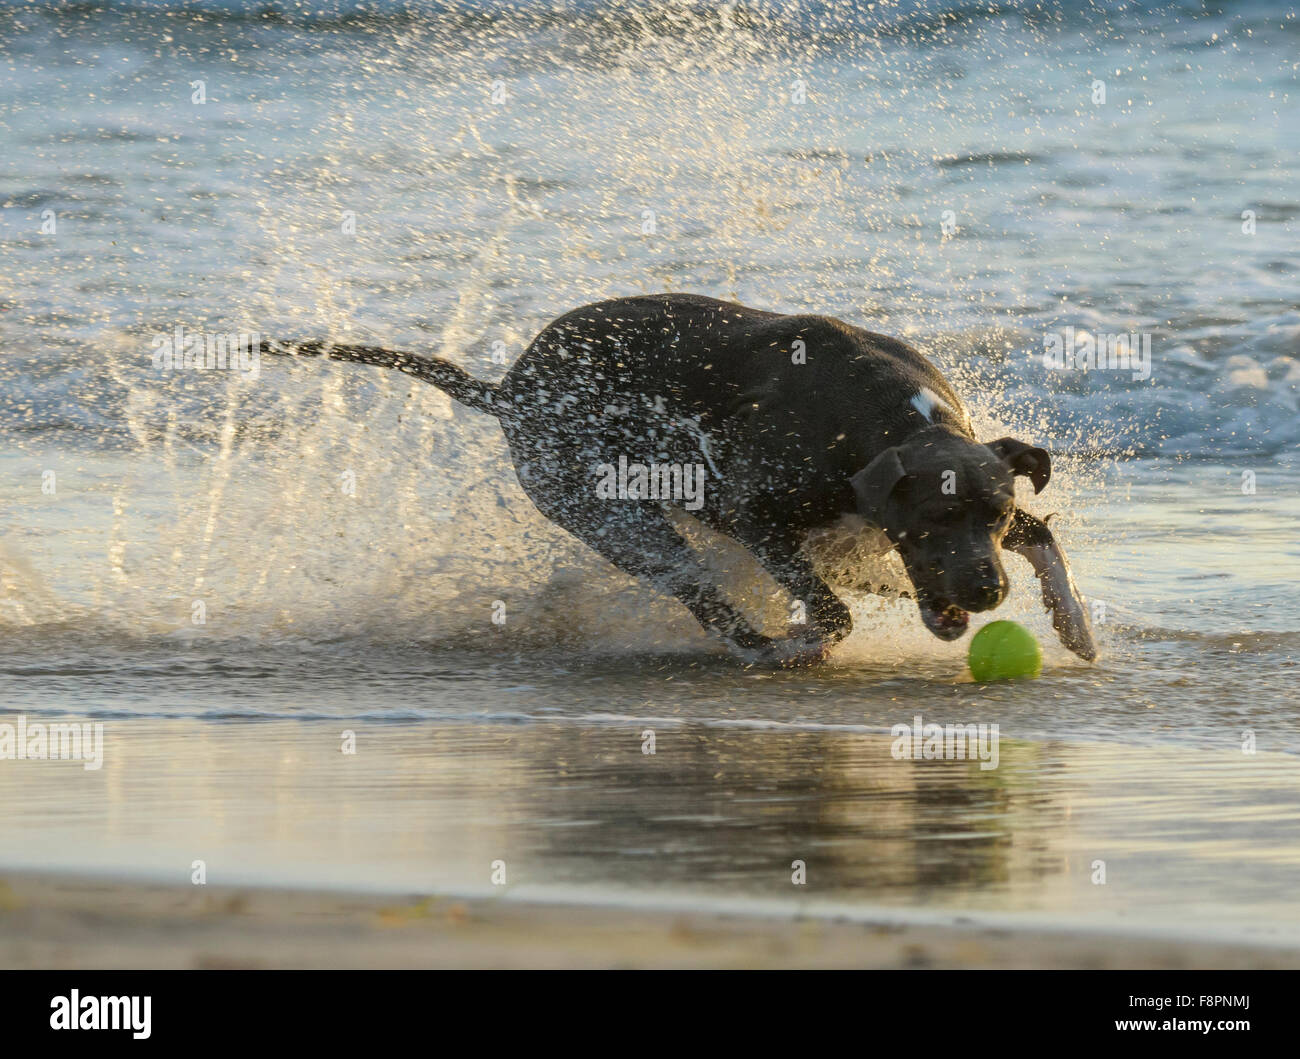 Dogs play, run and splash on Ocean Beach, CA shoreline - Stock Image